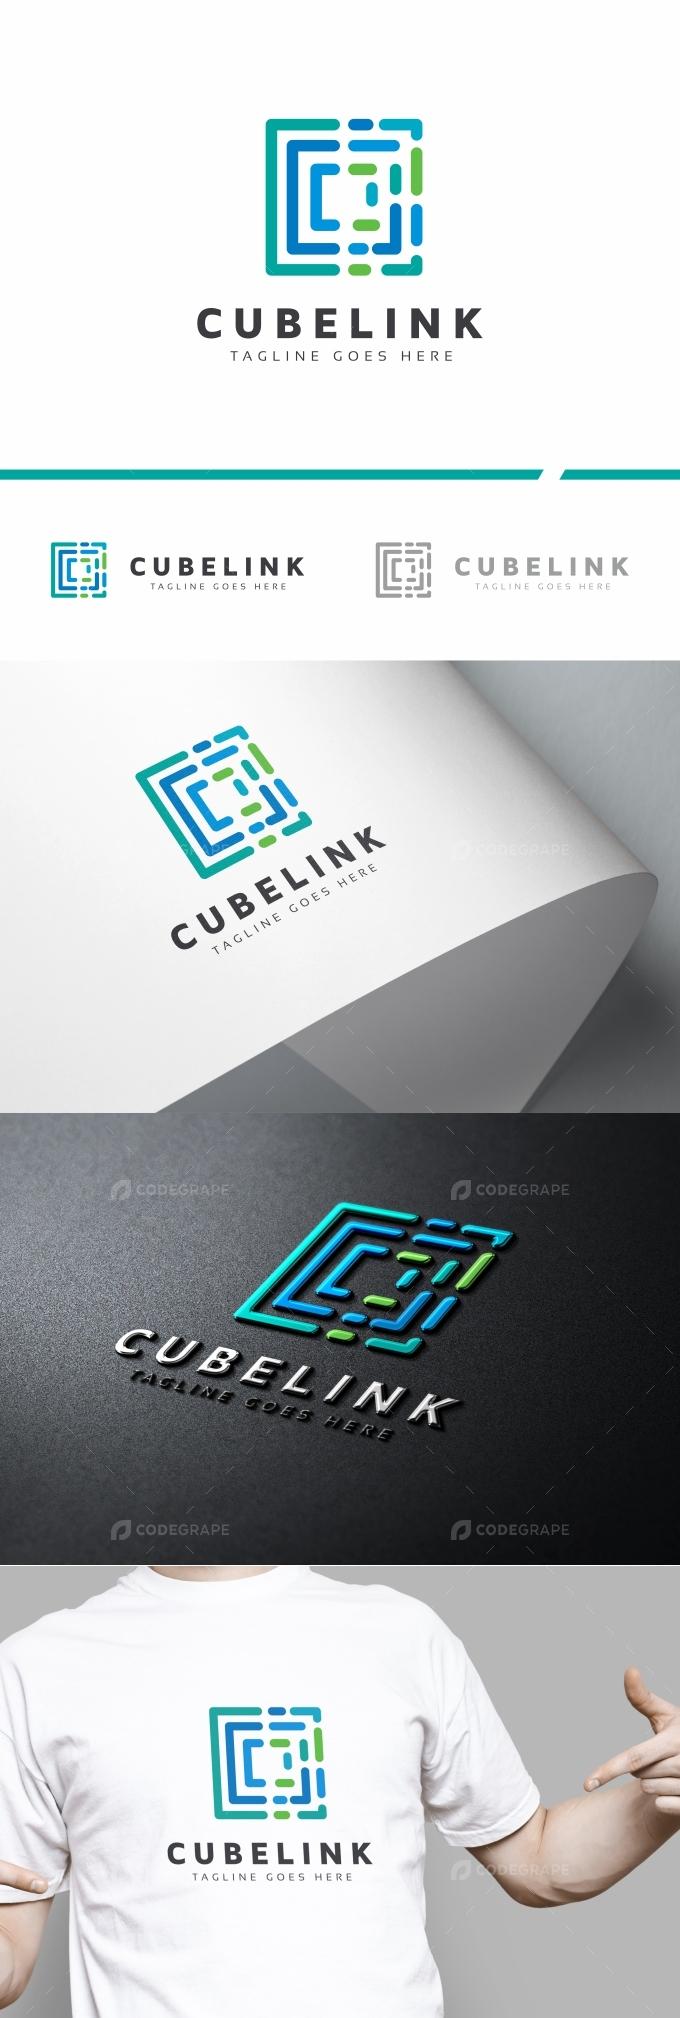 Cubelink Logo